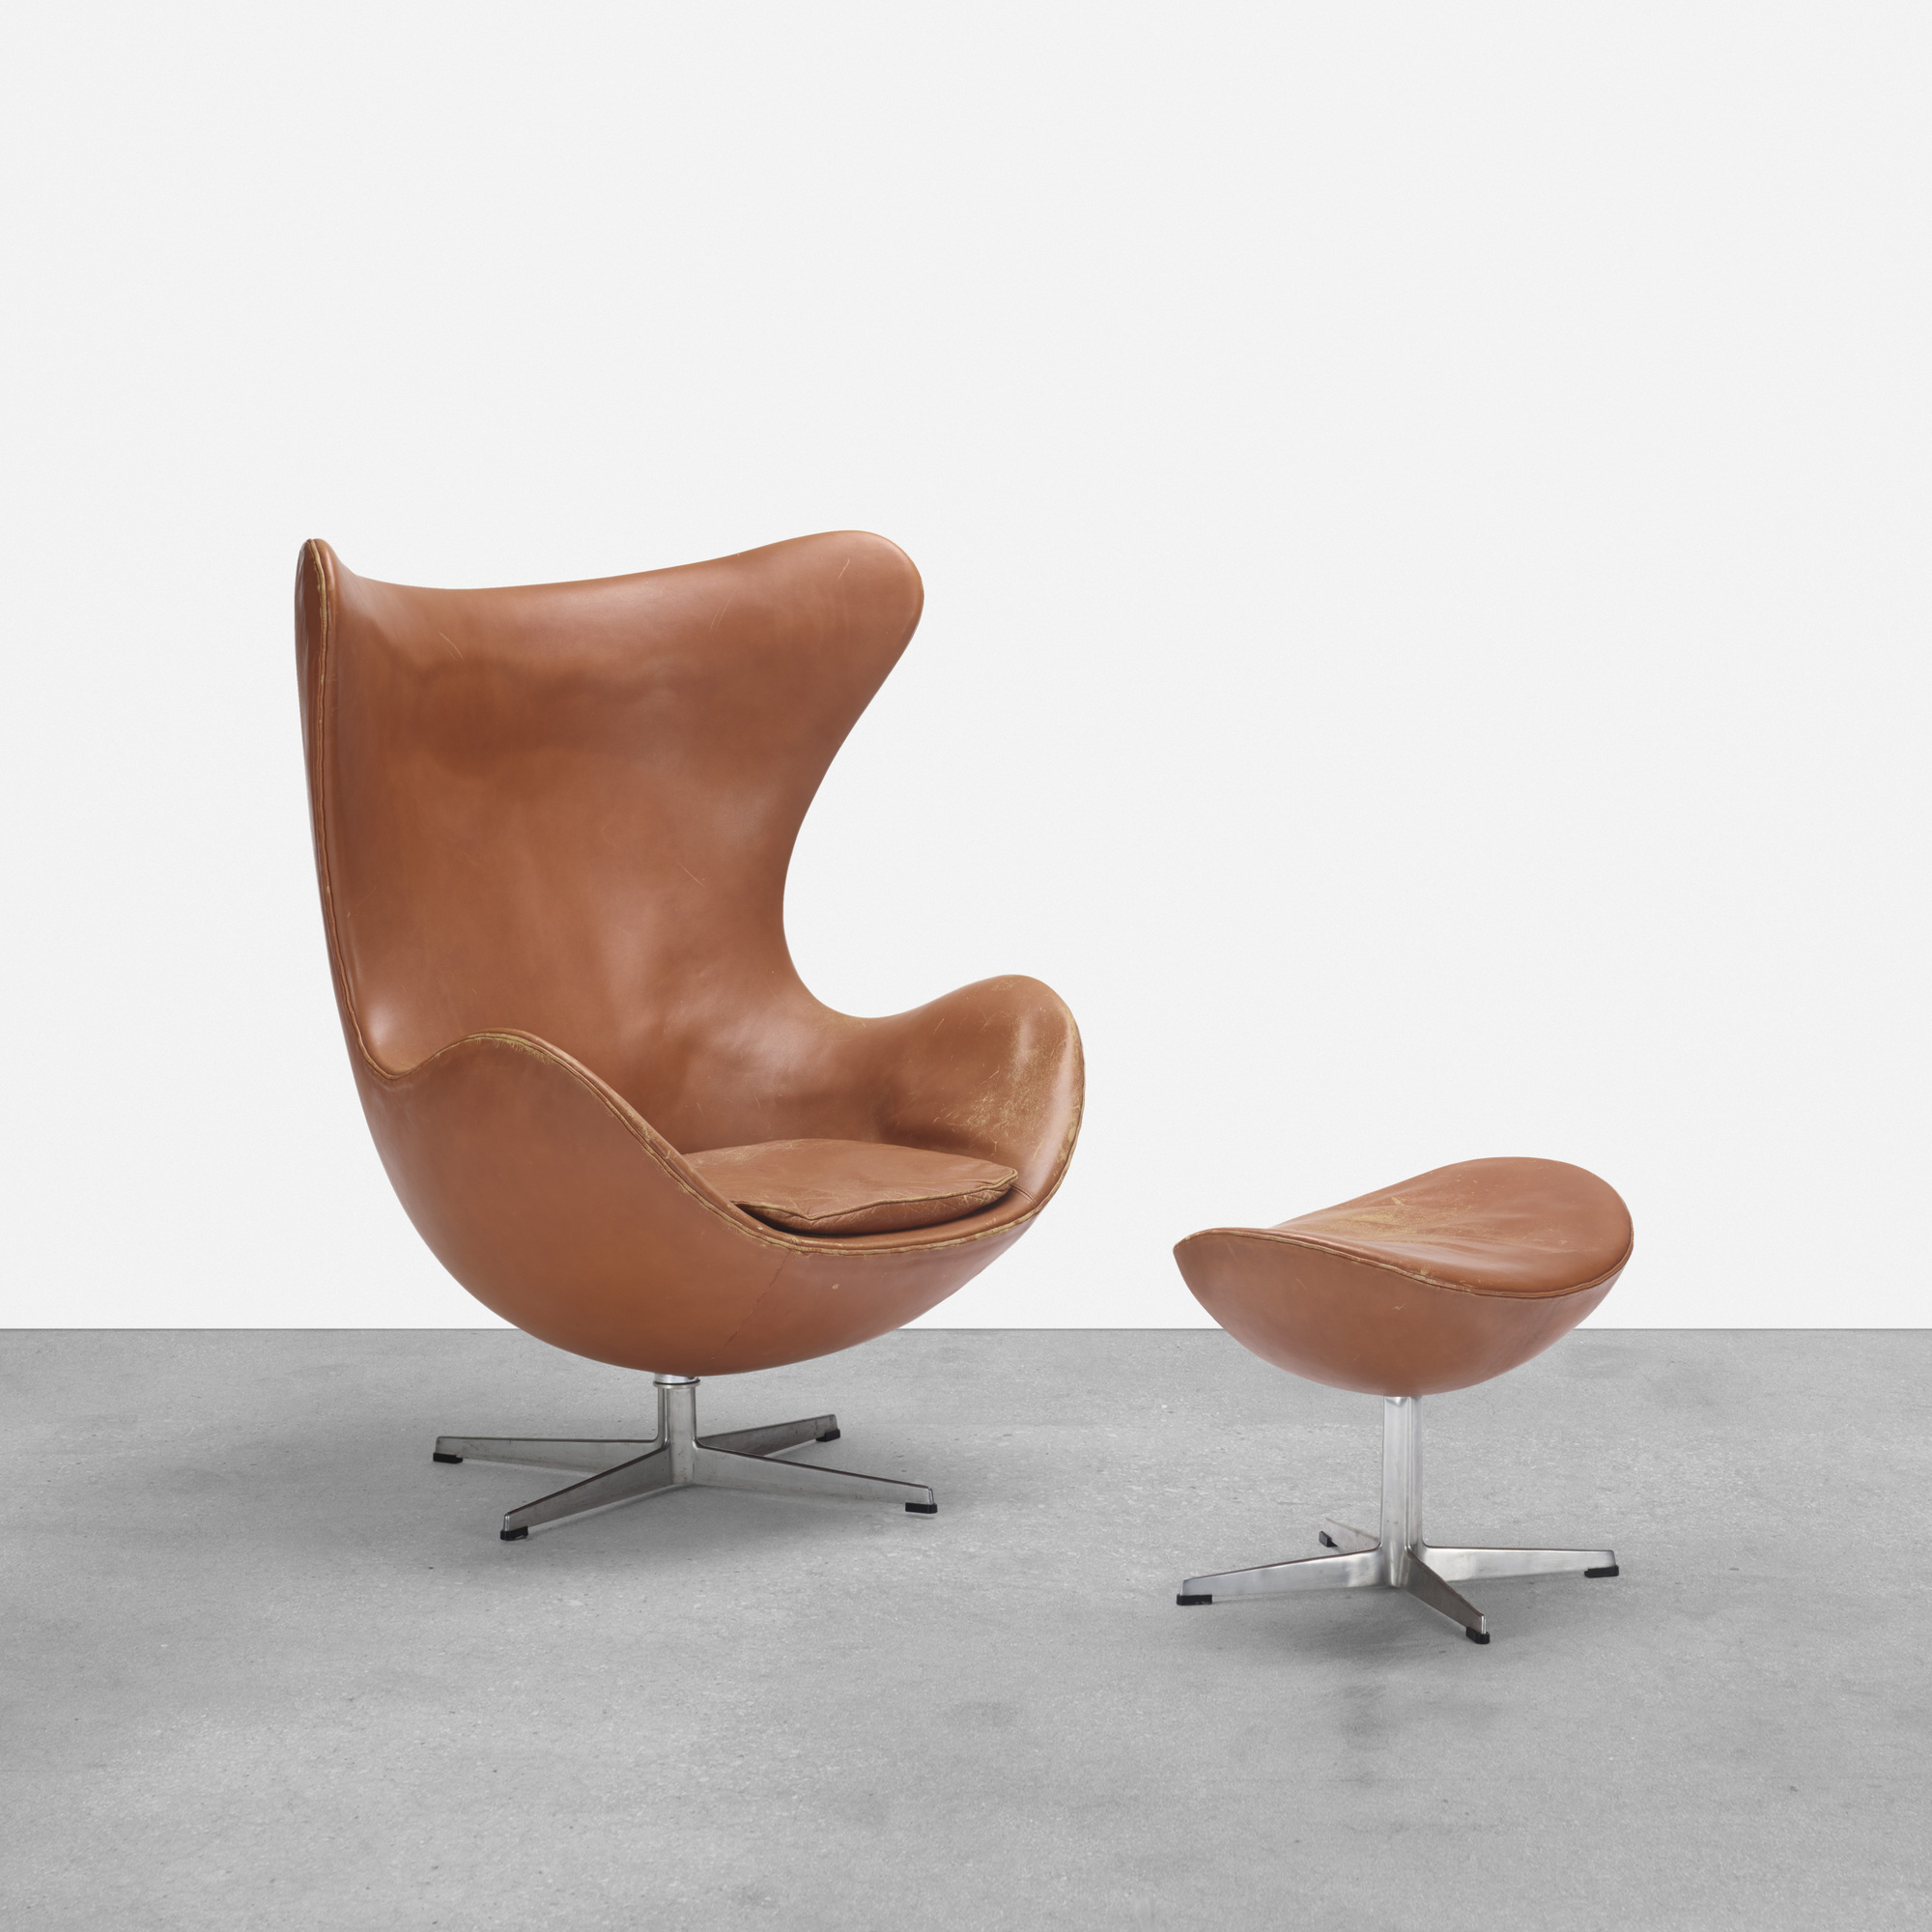 163: Arne Jacobsen / Egg Chair And Ottoman (1 Of 3)